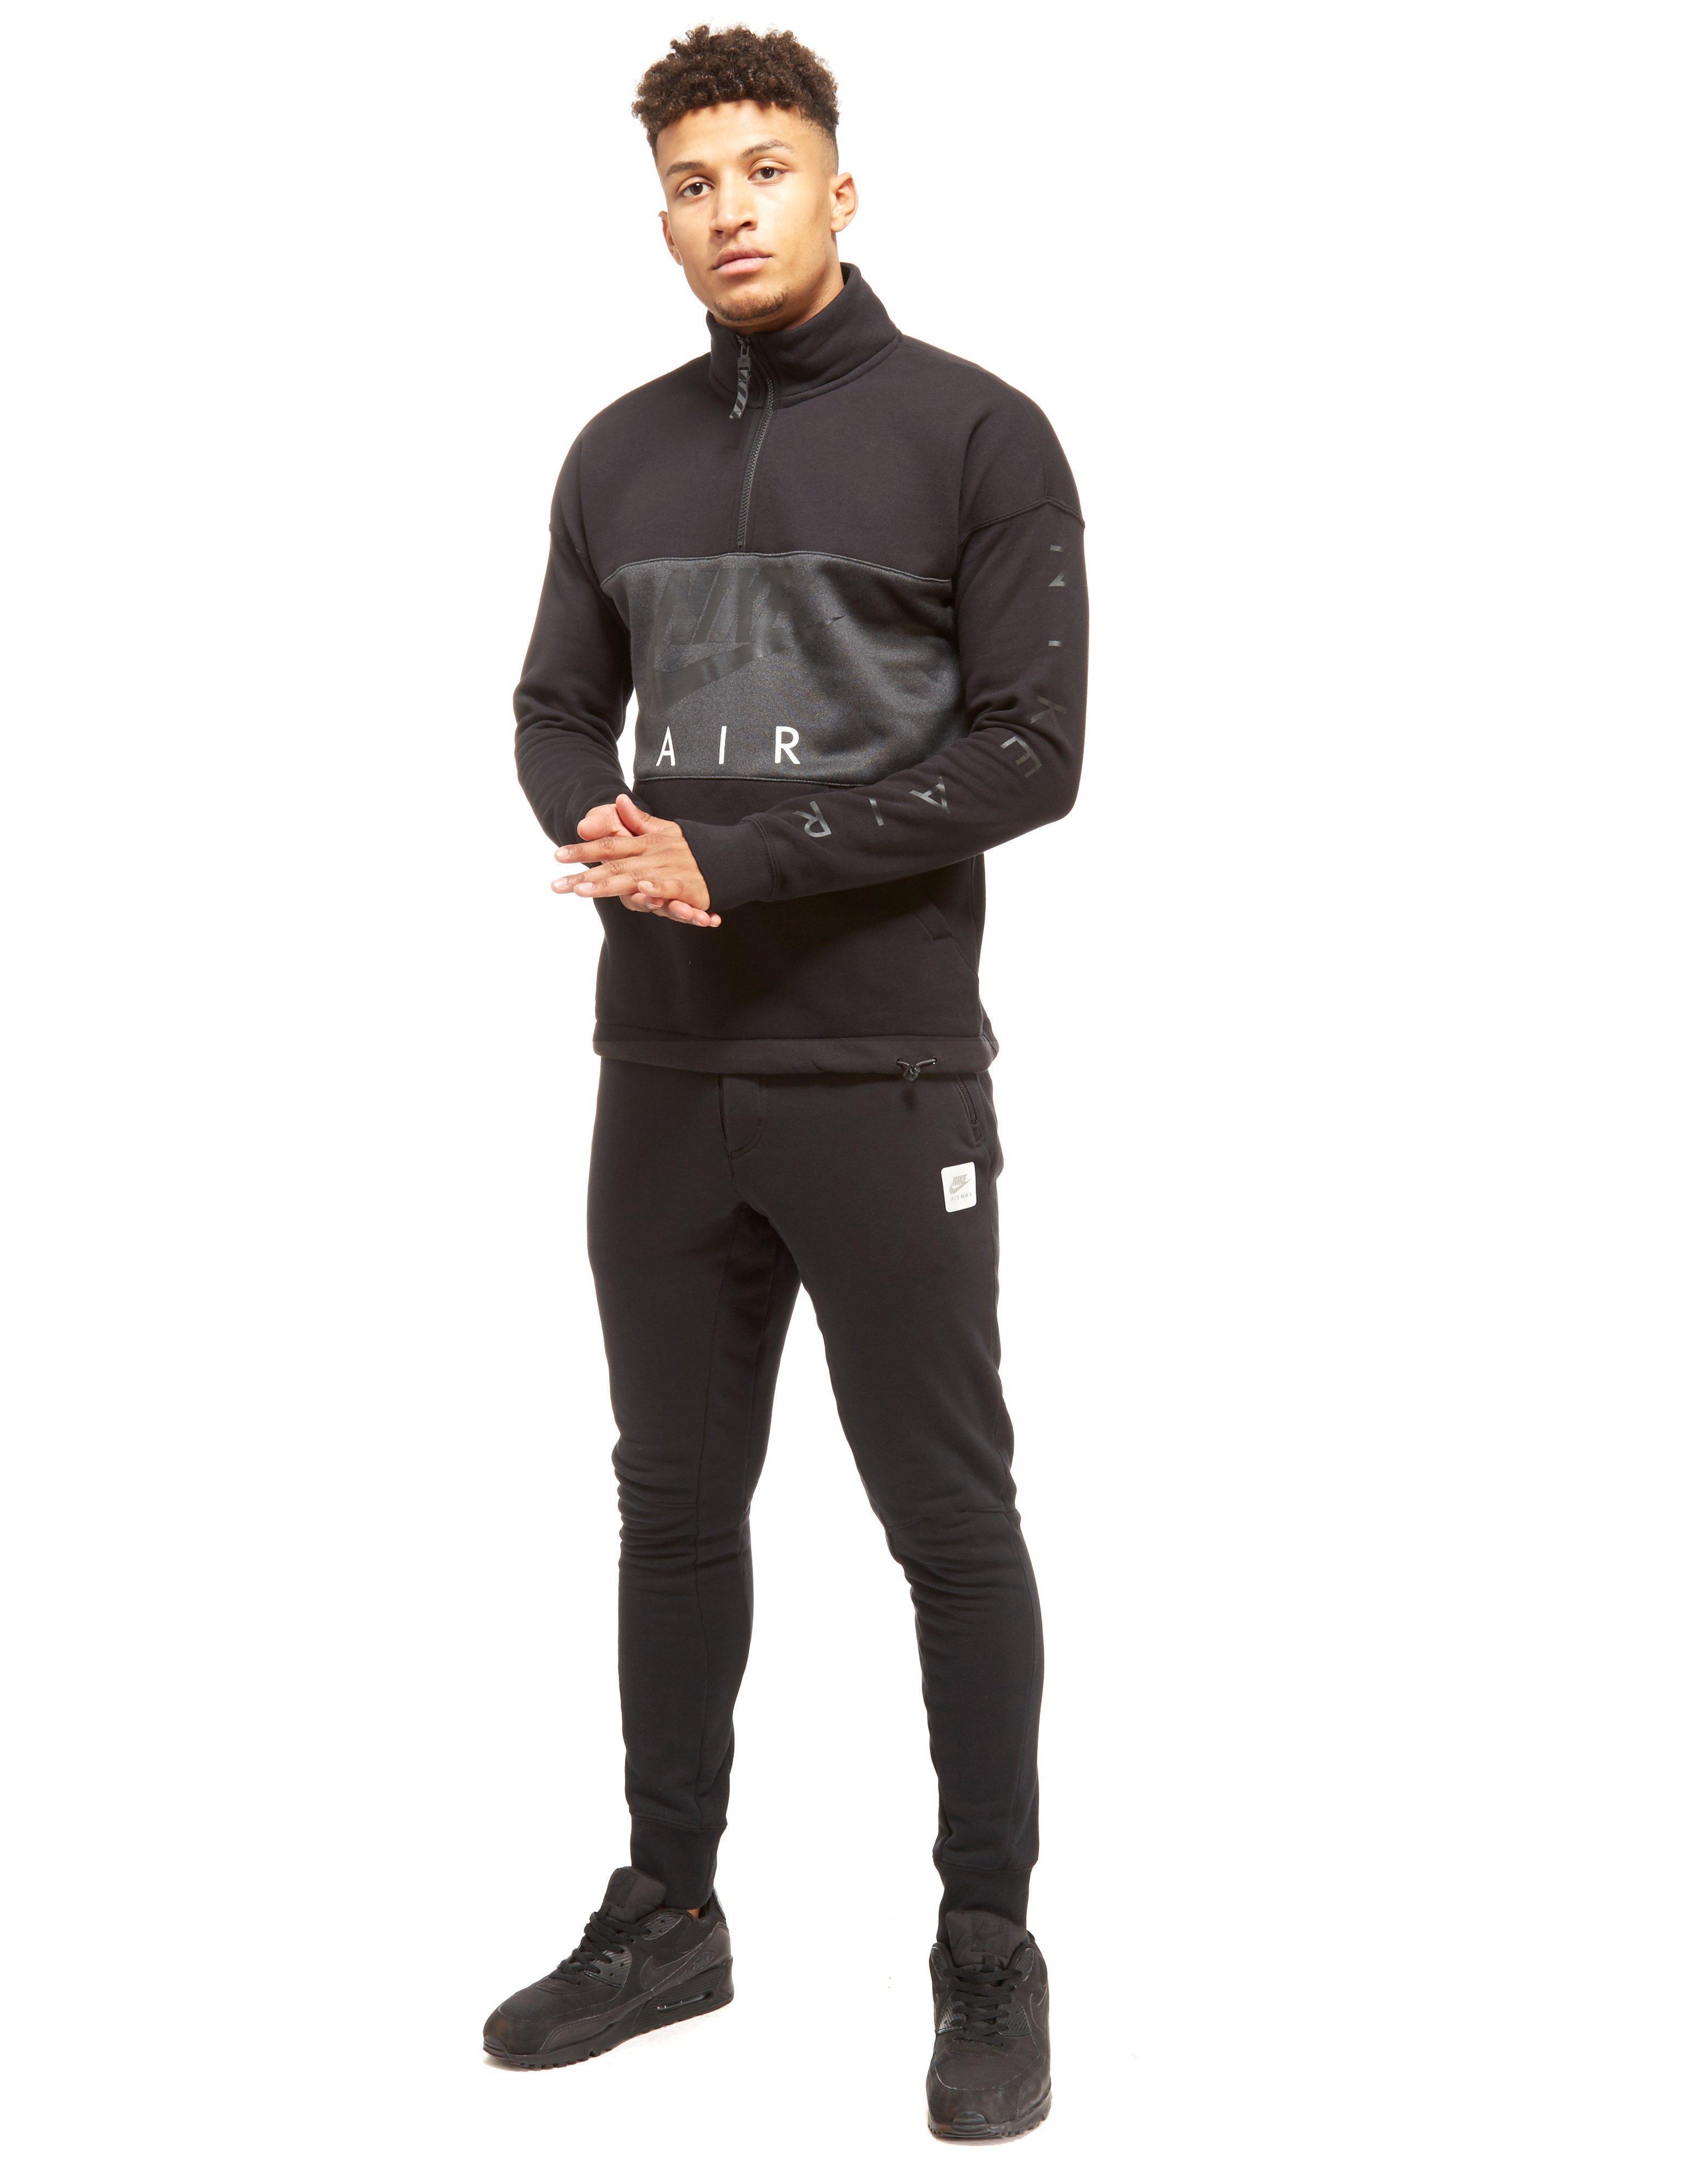 ee5f04a0fa4a Lyst - Nike Air Half Zip Sweatshirt in Black for Men